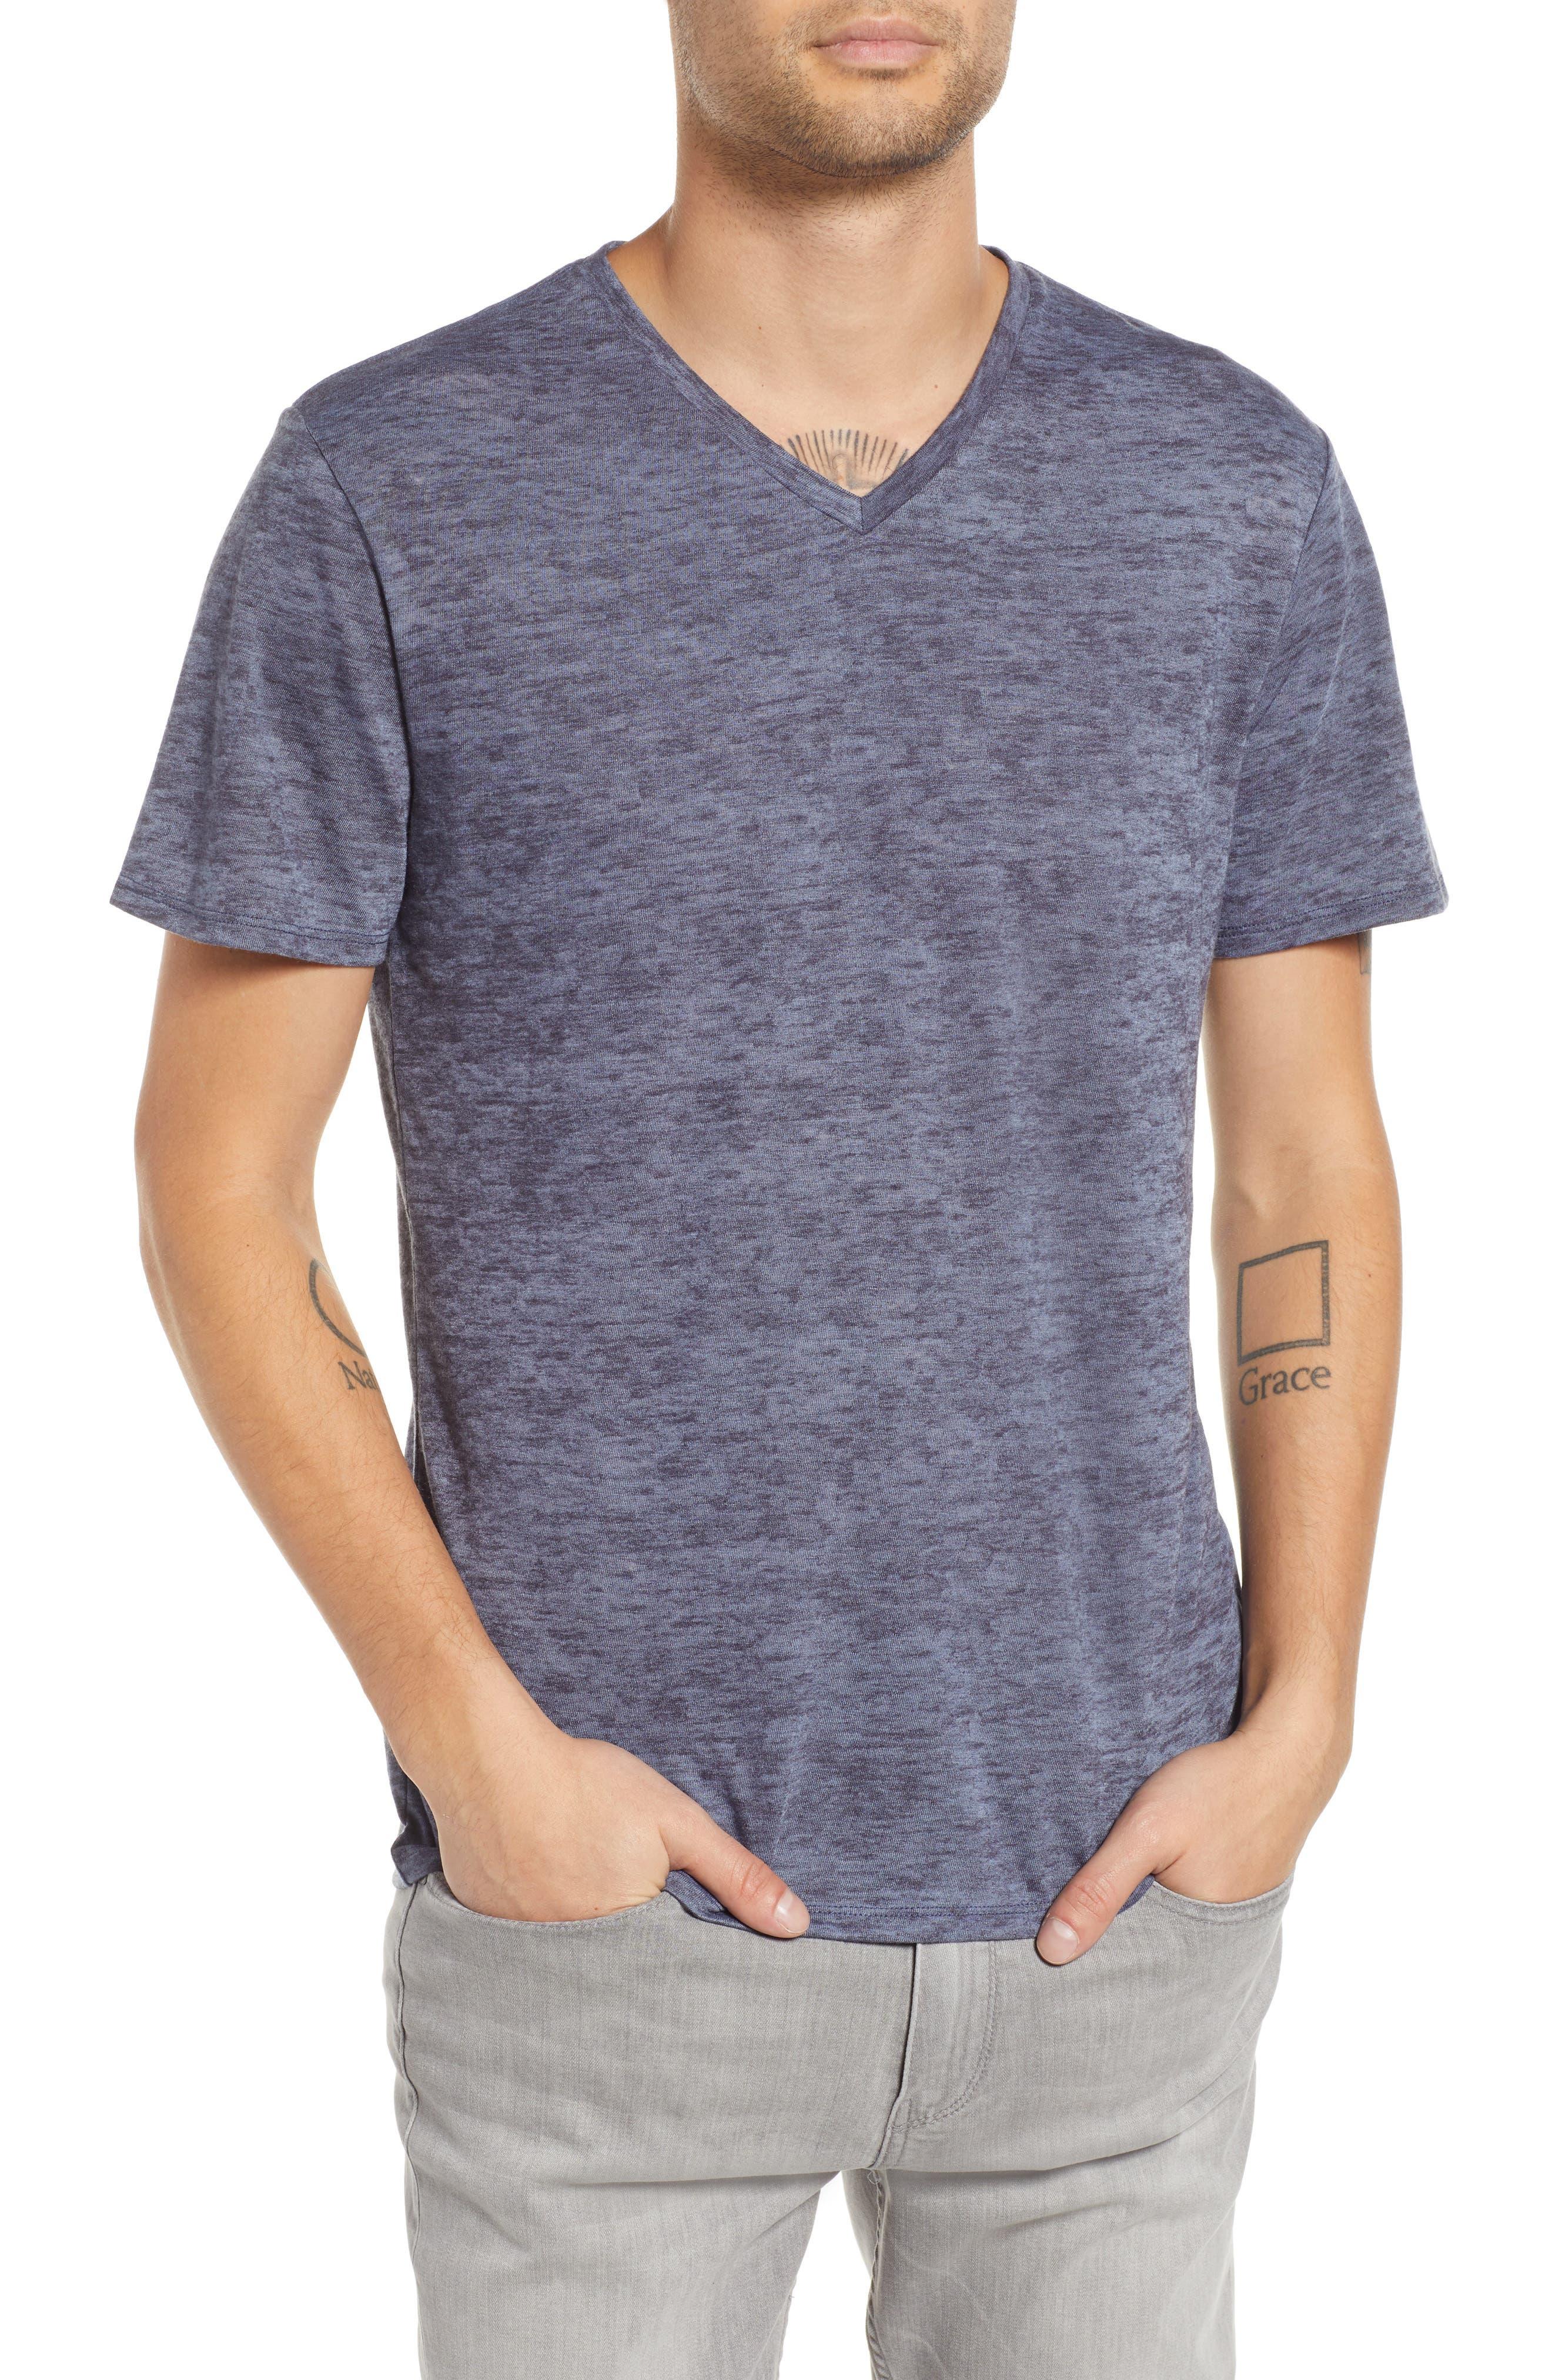 THE RAIL, Burnout V-Neck T-Shirt, Main thumbnail 1, color, BLUE STONEWASH - NAVY BURNOUT